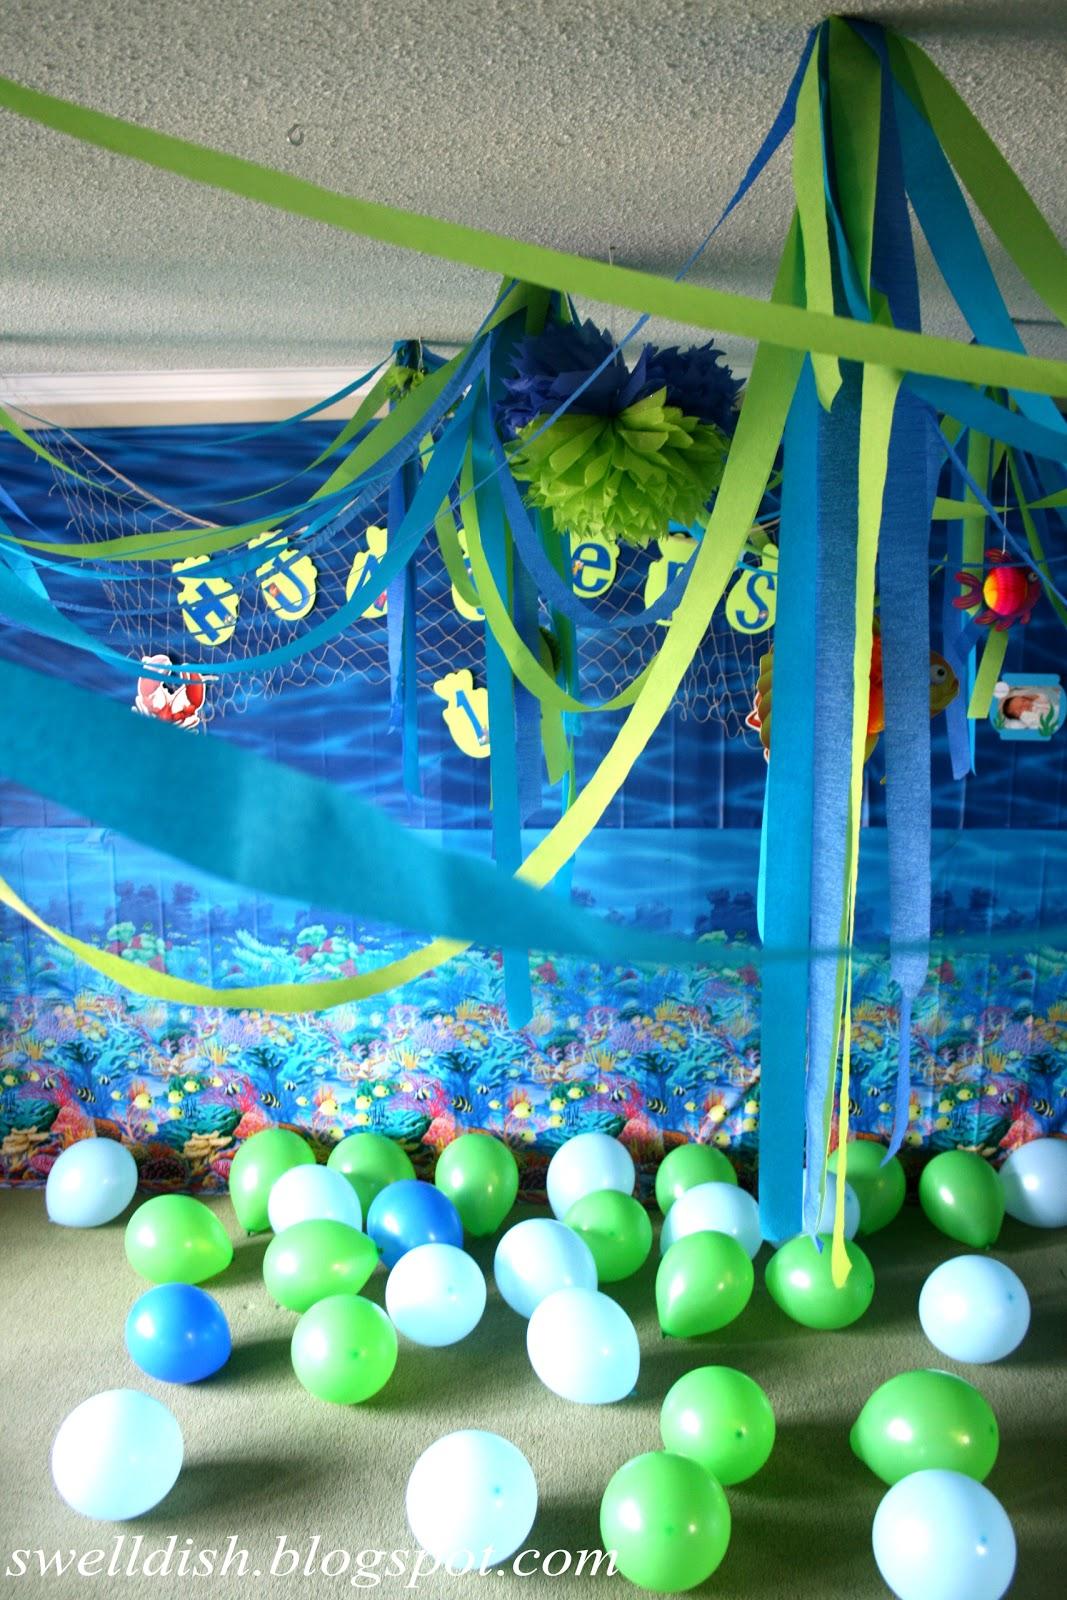 The swell dish ocean nautical under the sea party room decor for Ocean decor ideas